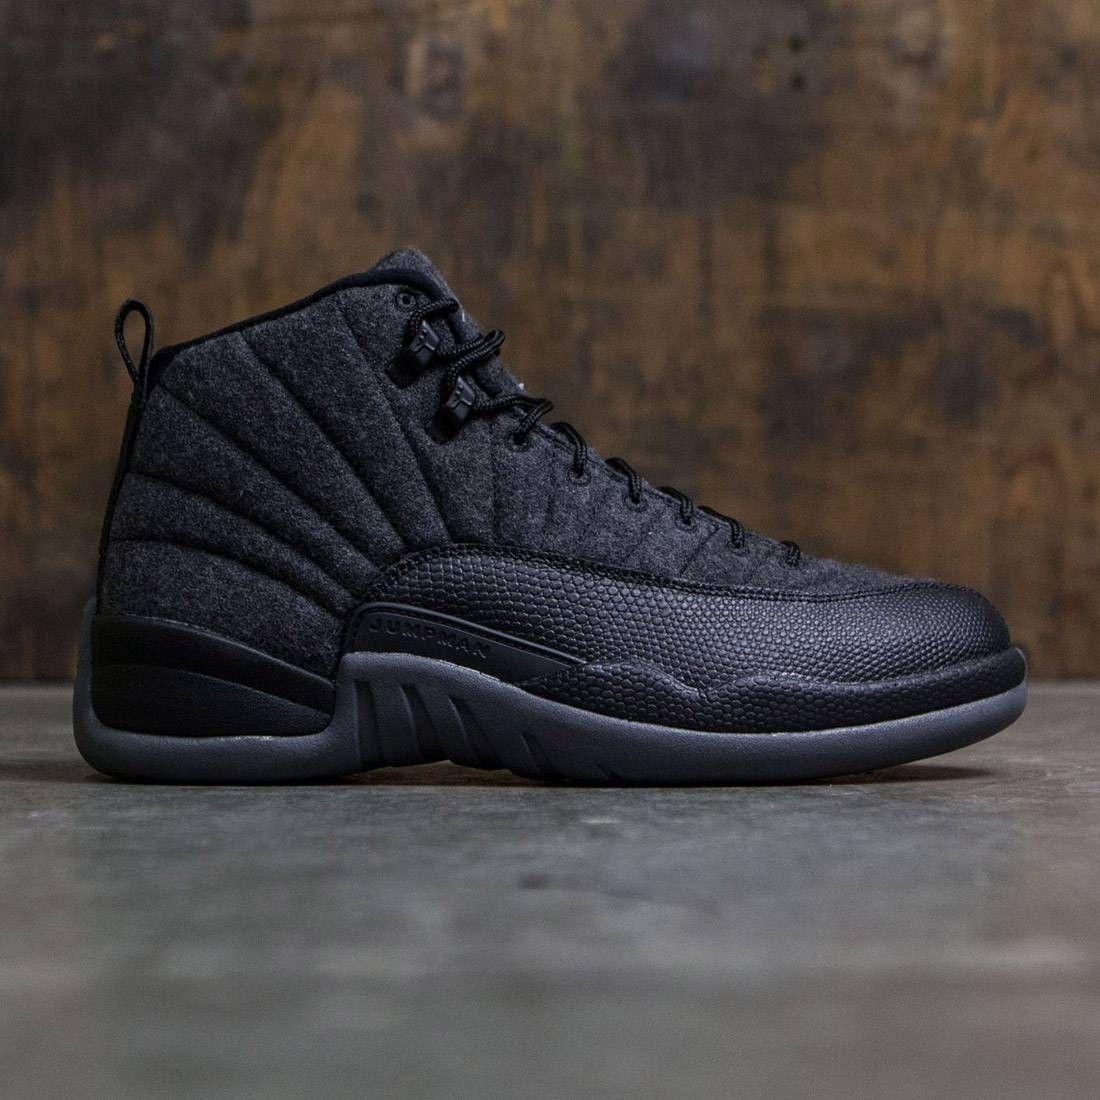 01aa671ce662 Jordan Men Air Jordan 12 Retro Wool (dark grey   metallic silver-black)